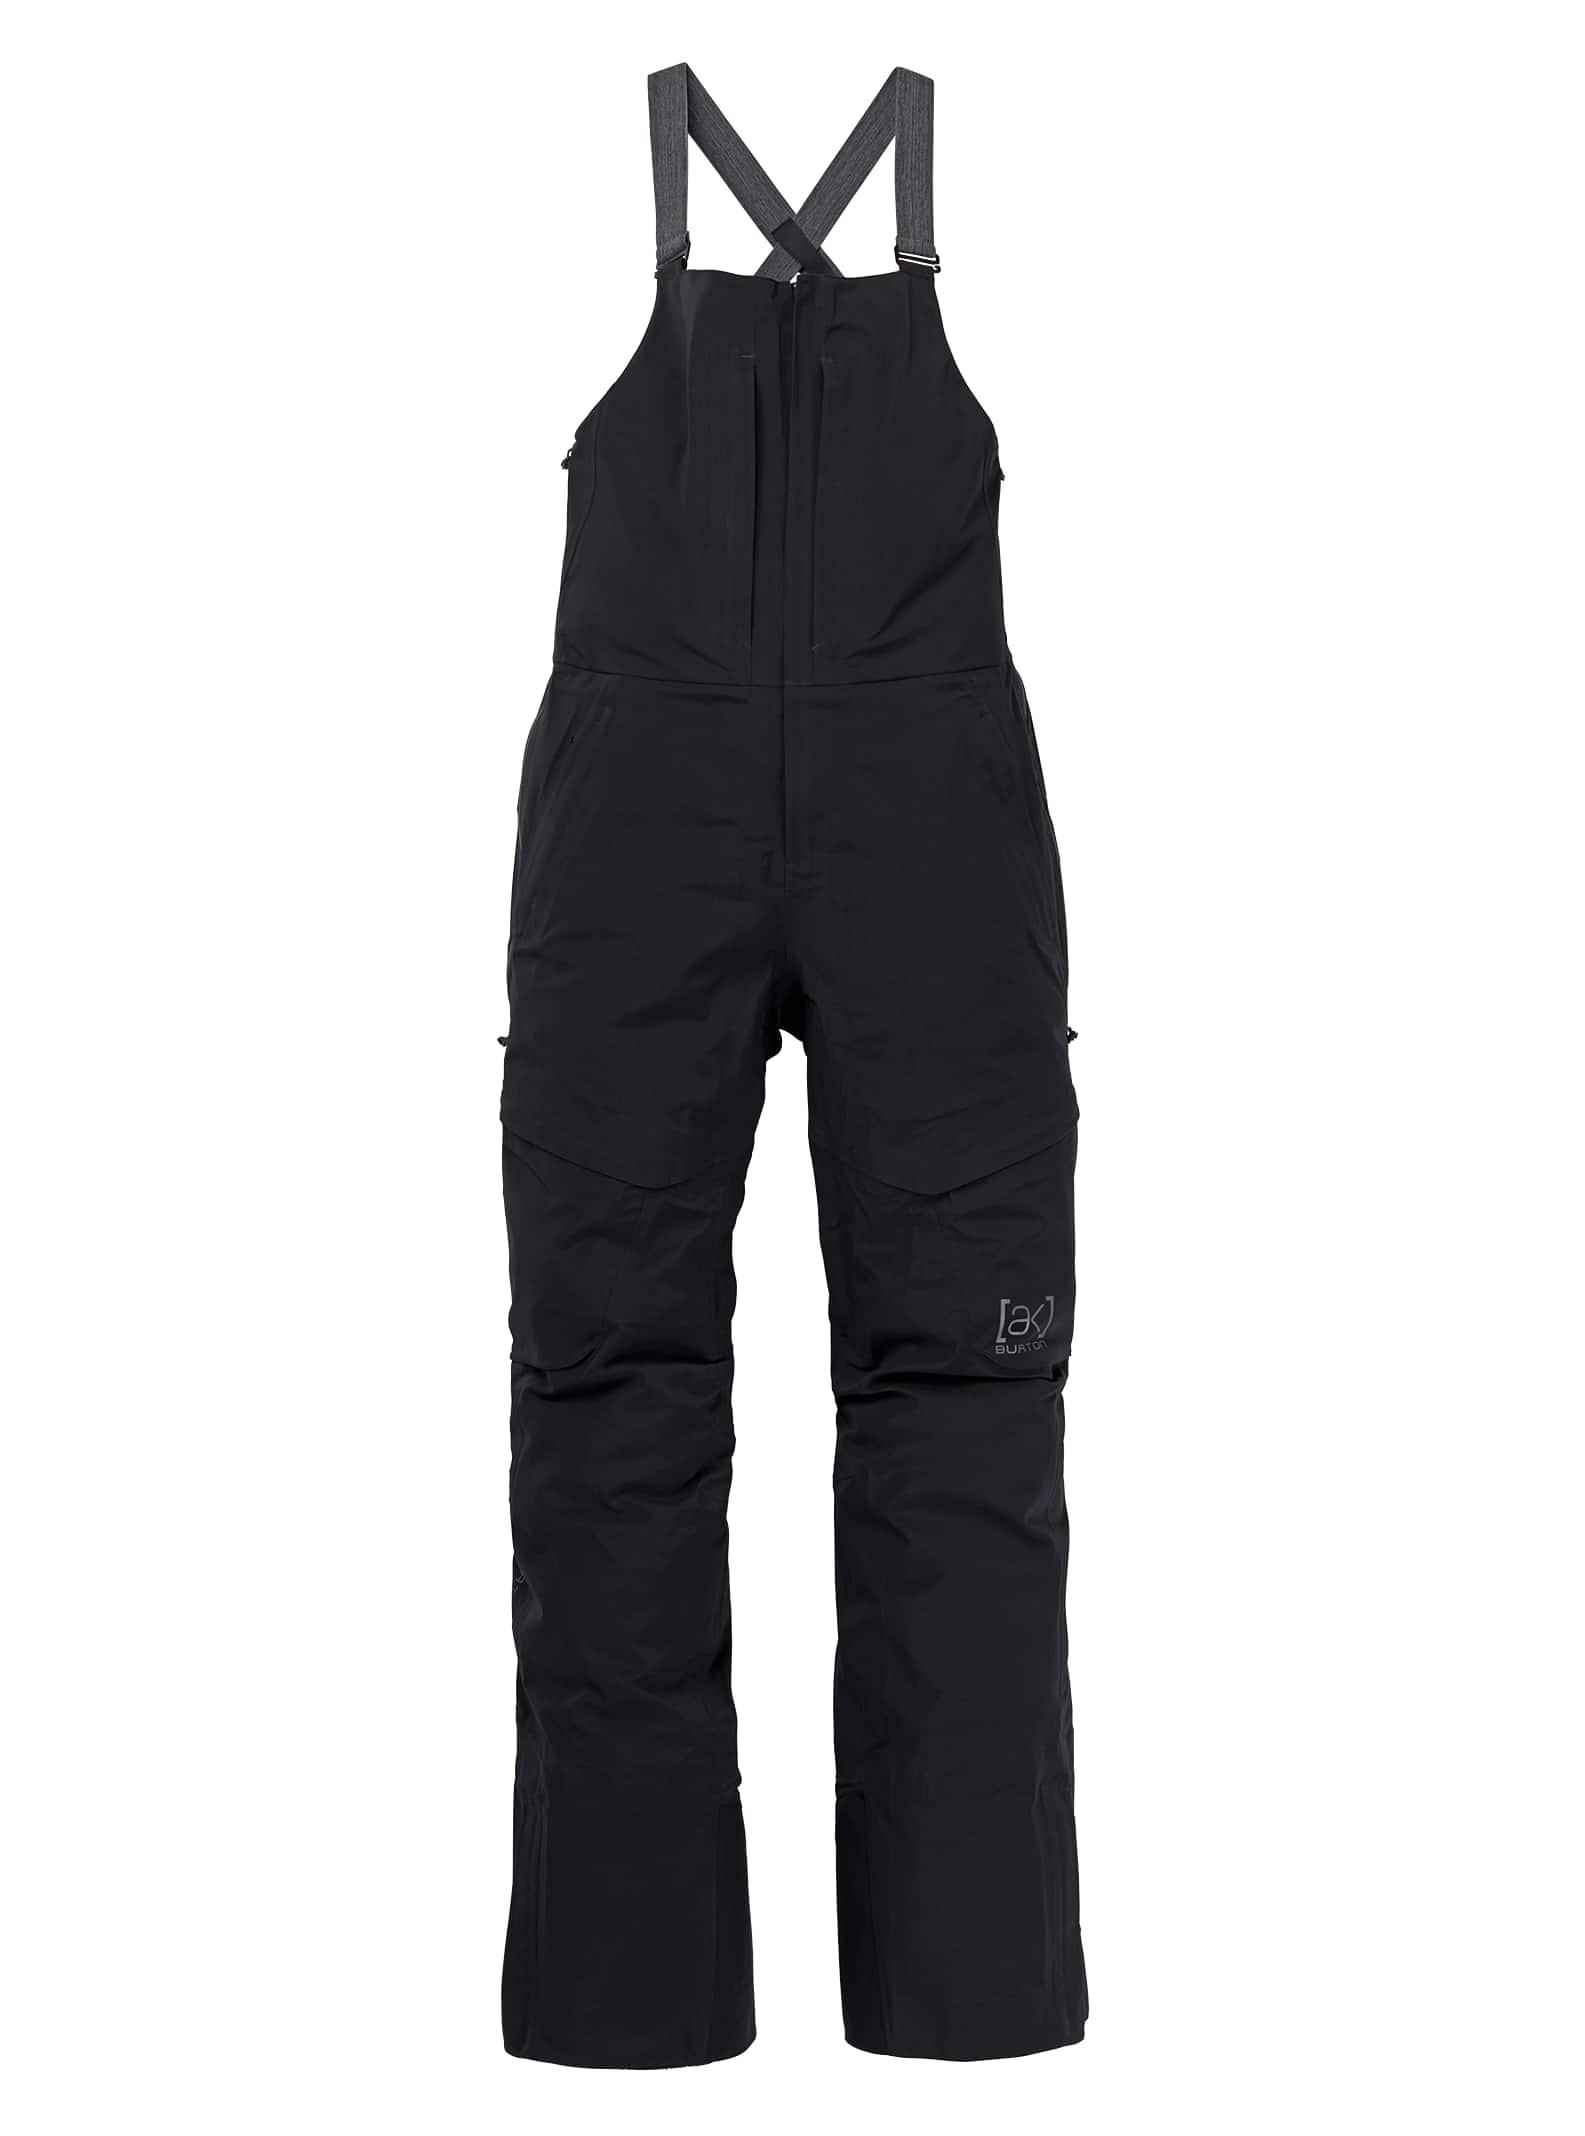 Burton [ak] GORE‑TEX 3L Kimmy Stretch skidbyxa för damer, True Black, XL